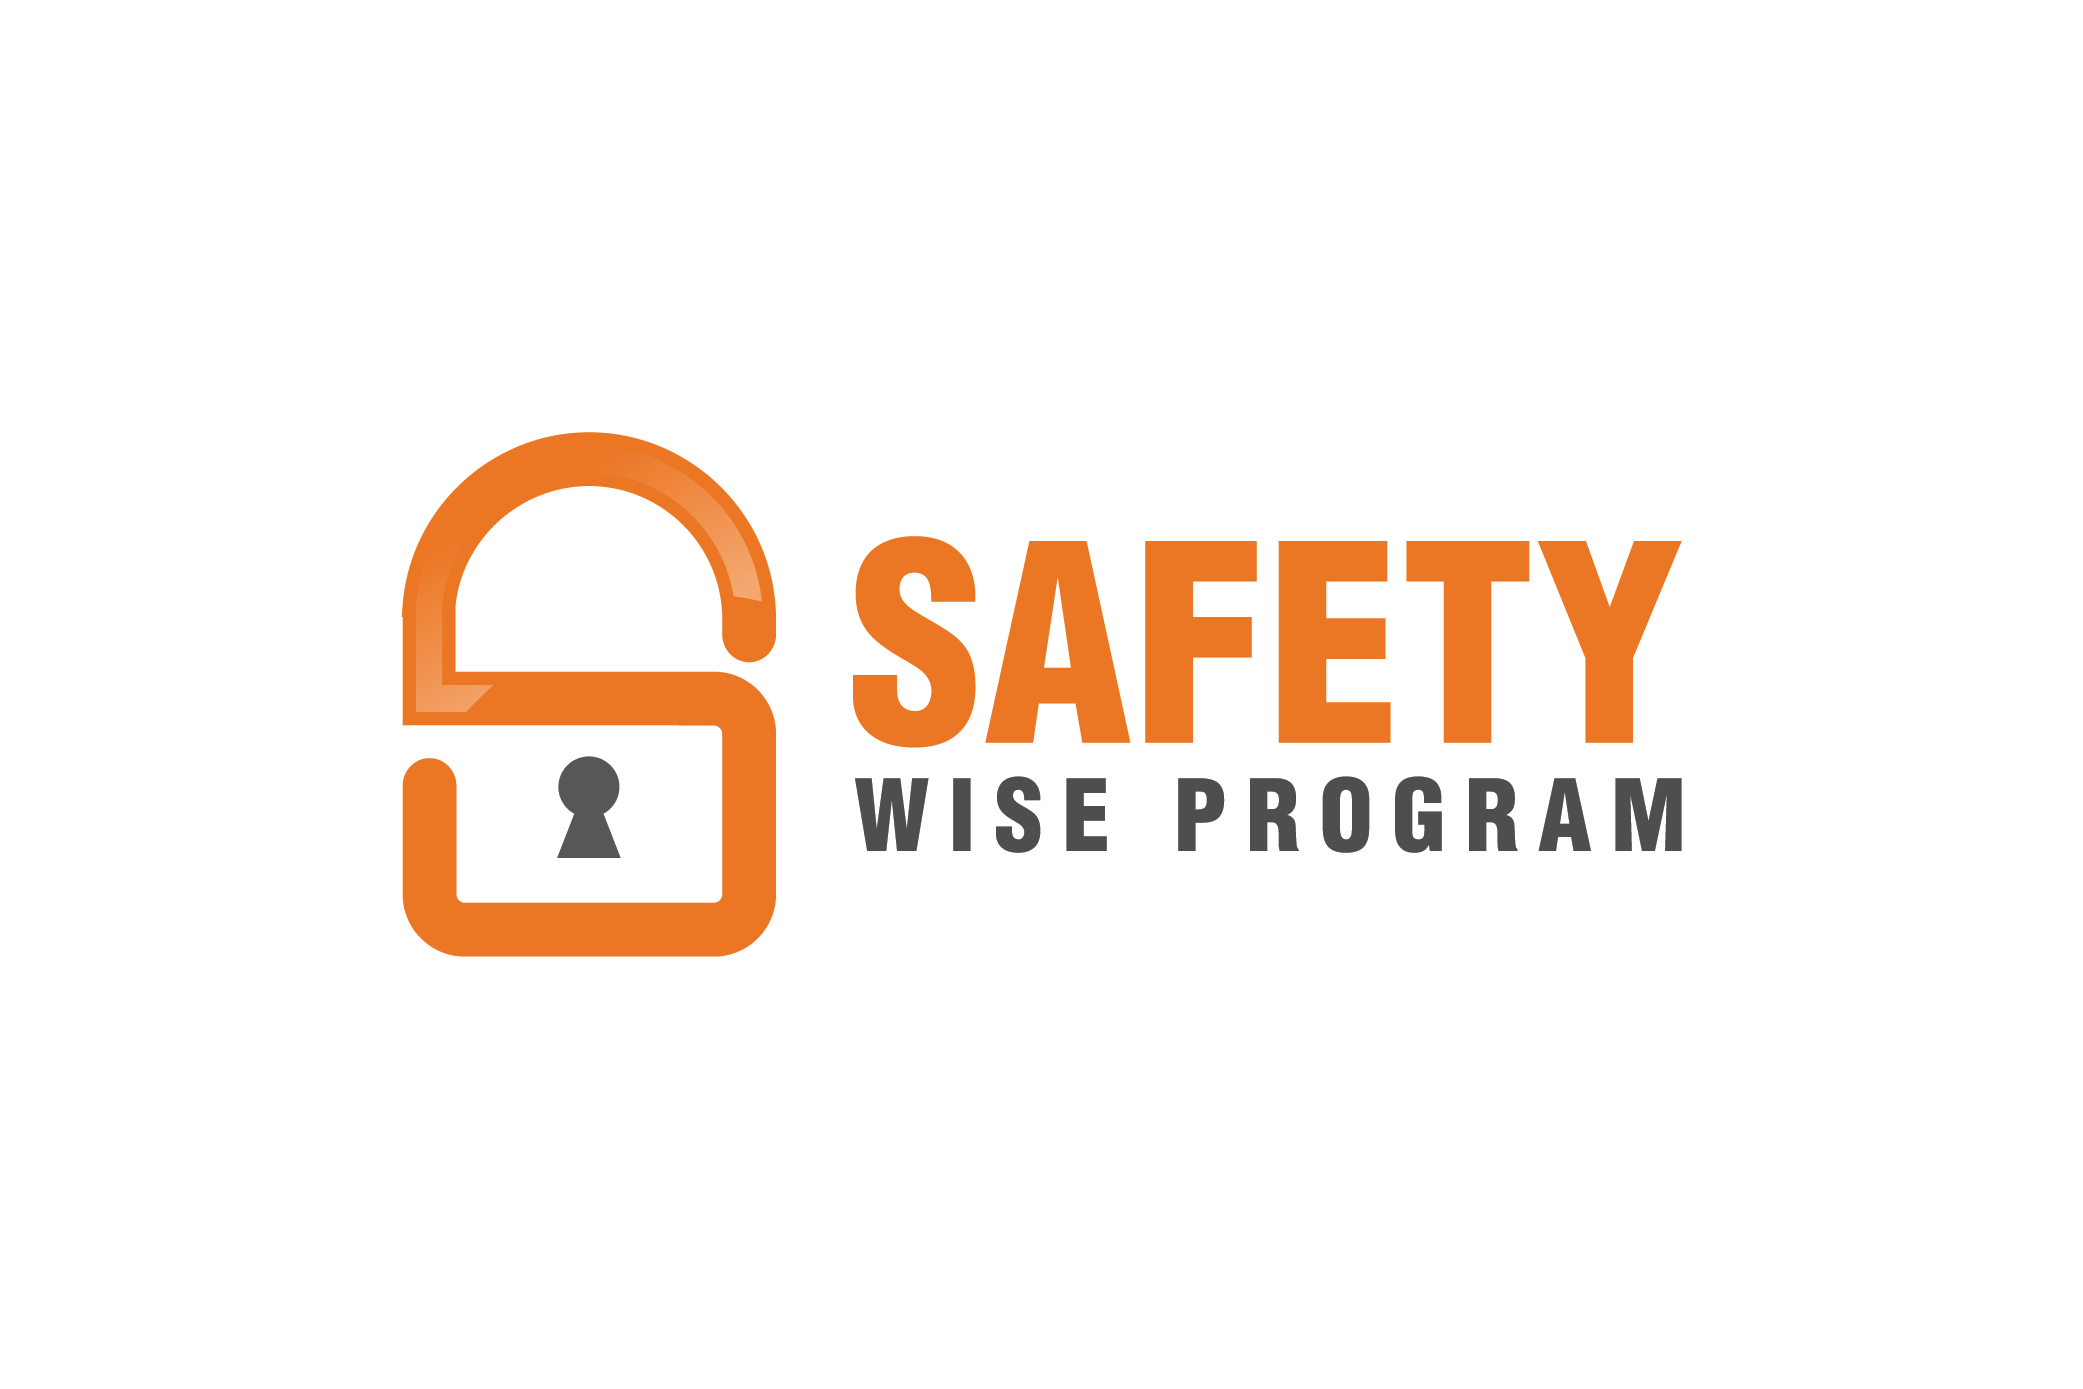 Logo Design by Raheel Baloch - Entry No. 64 in the Logo Design Contest New Logo Design for Safety Wise Program.